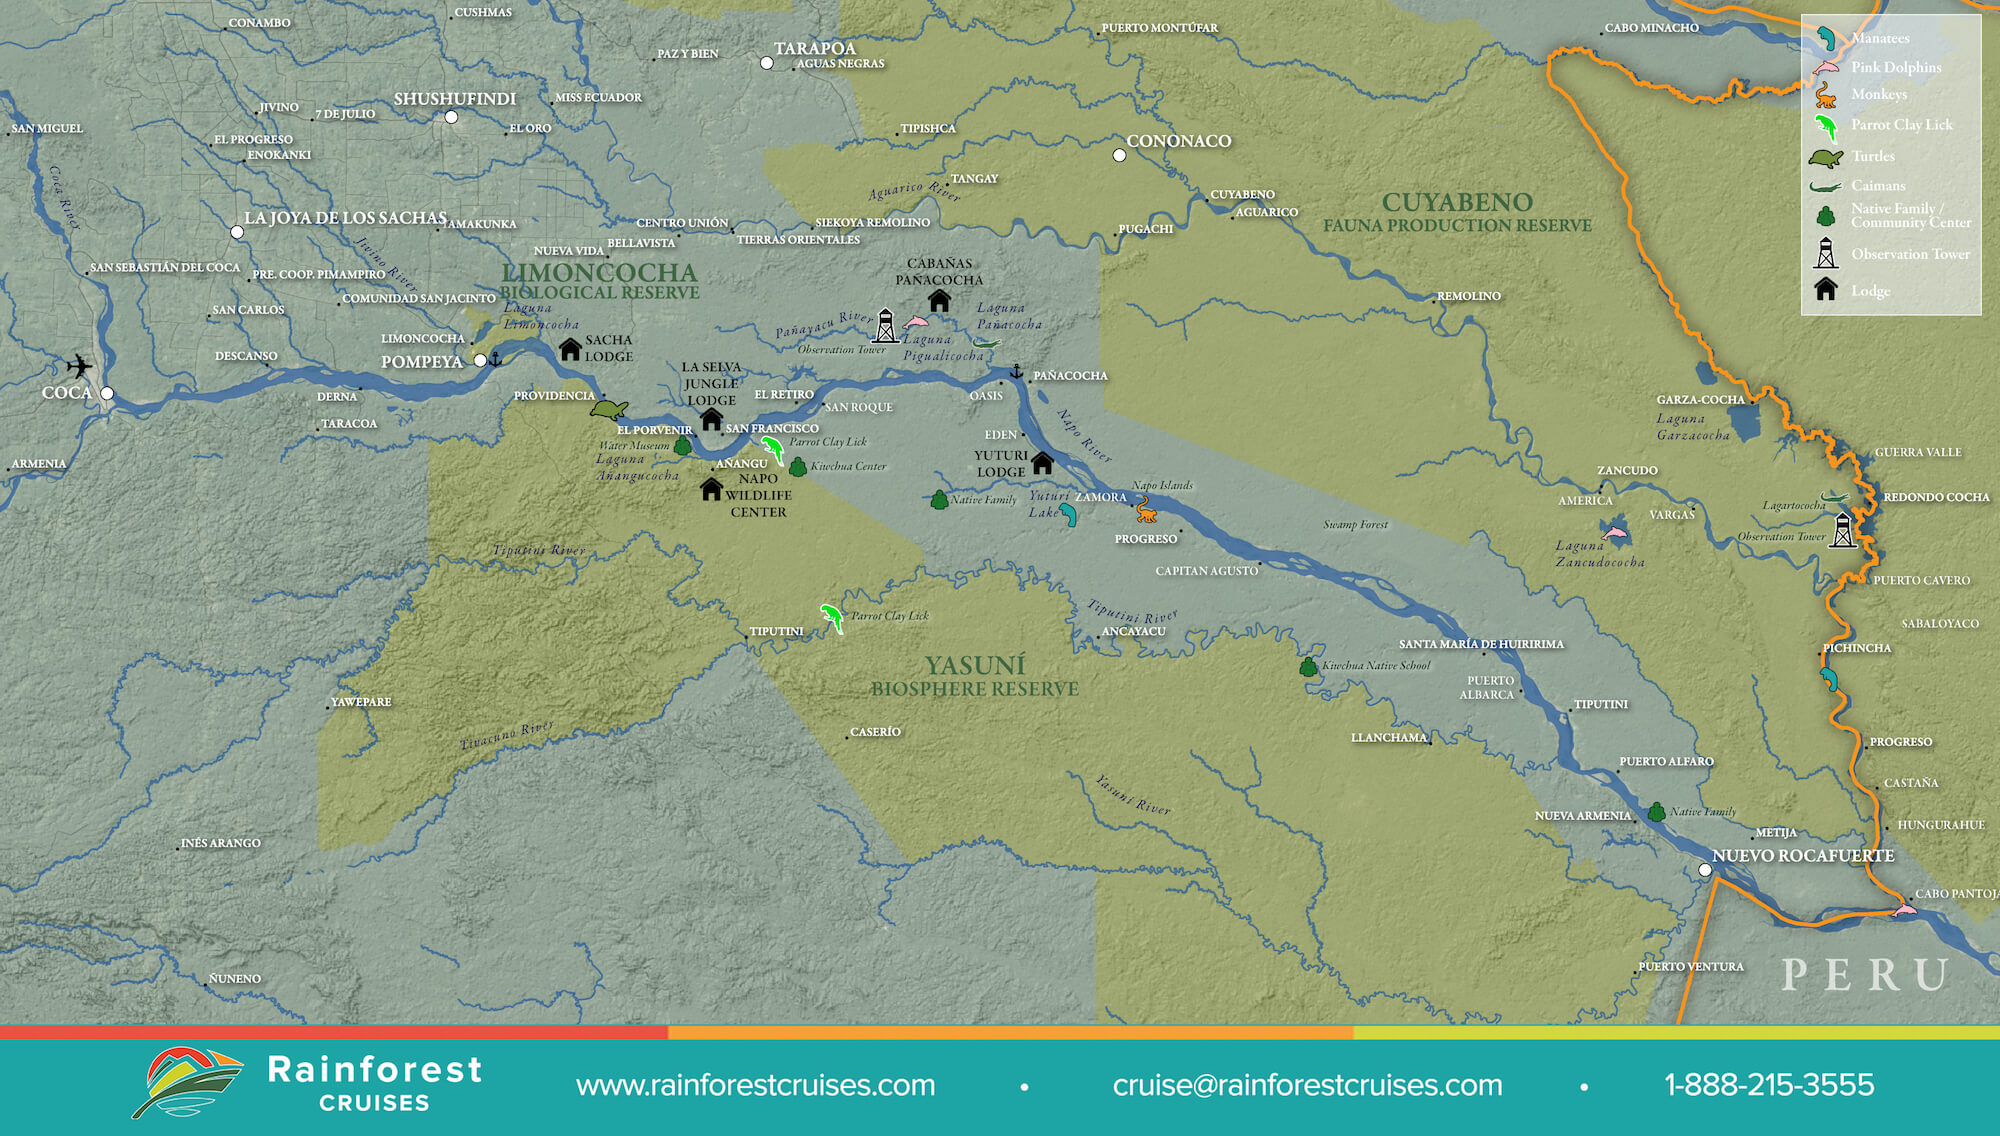 Amazon River Ecuador Map | Rainforest Cruises on map of caye caulker, map of burning man, map of cave, map of jeju island,